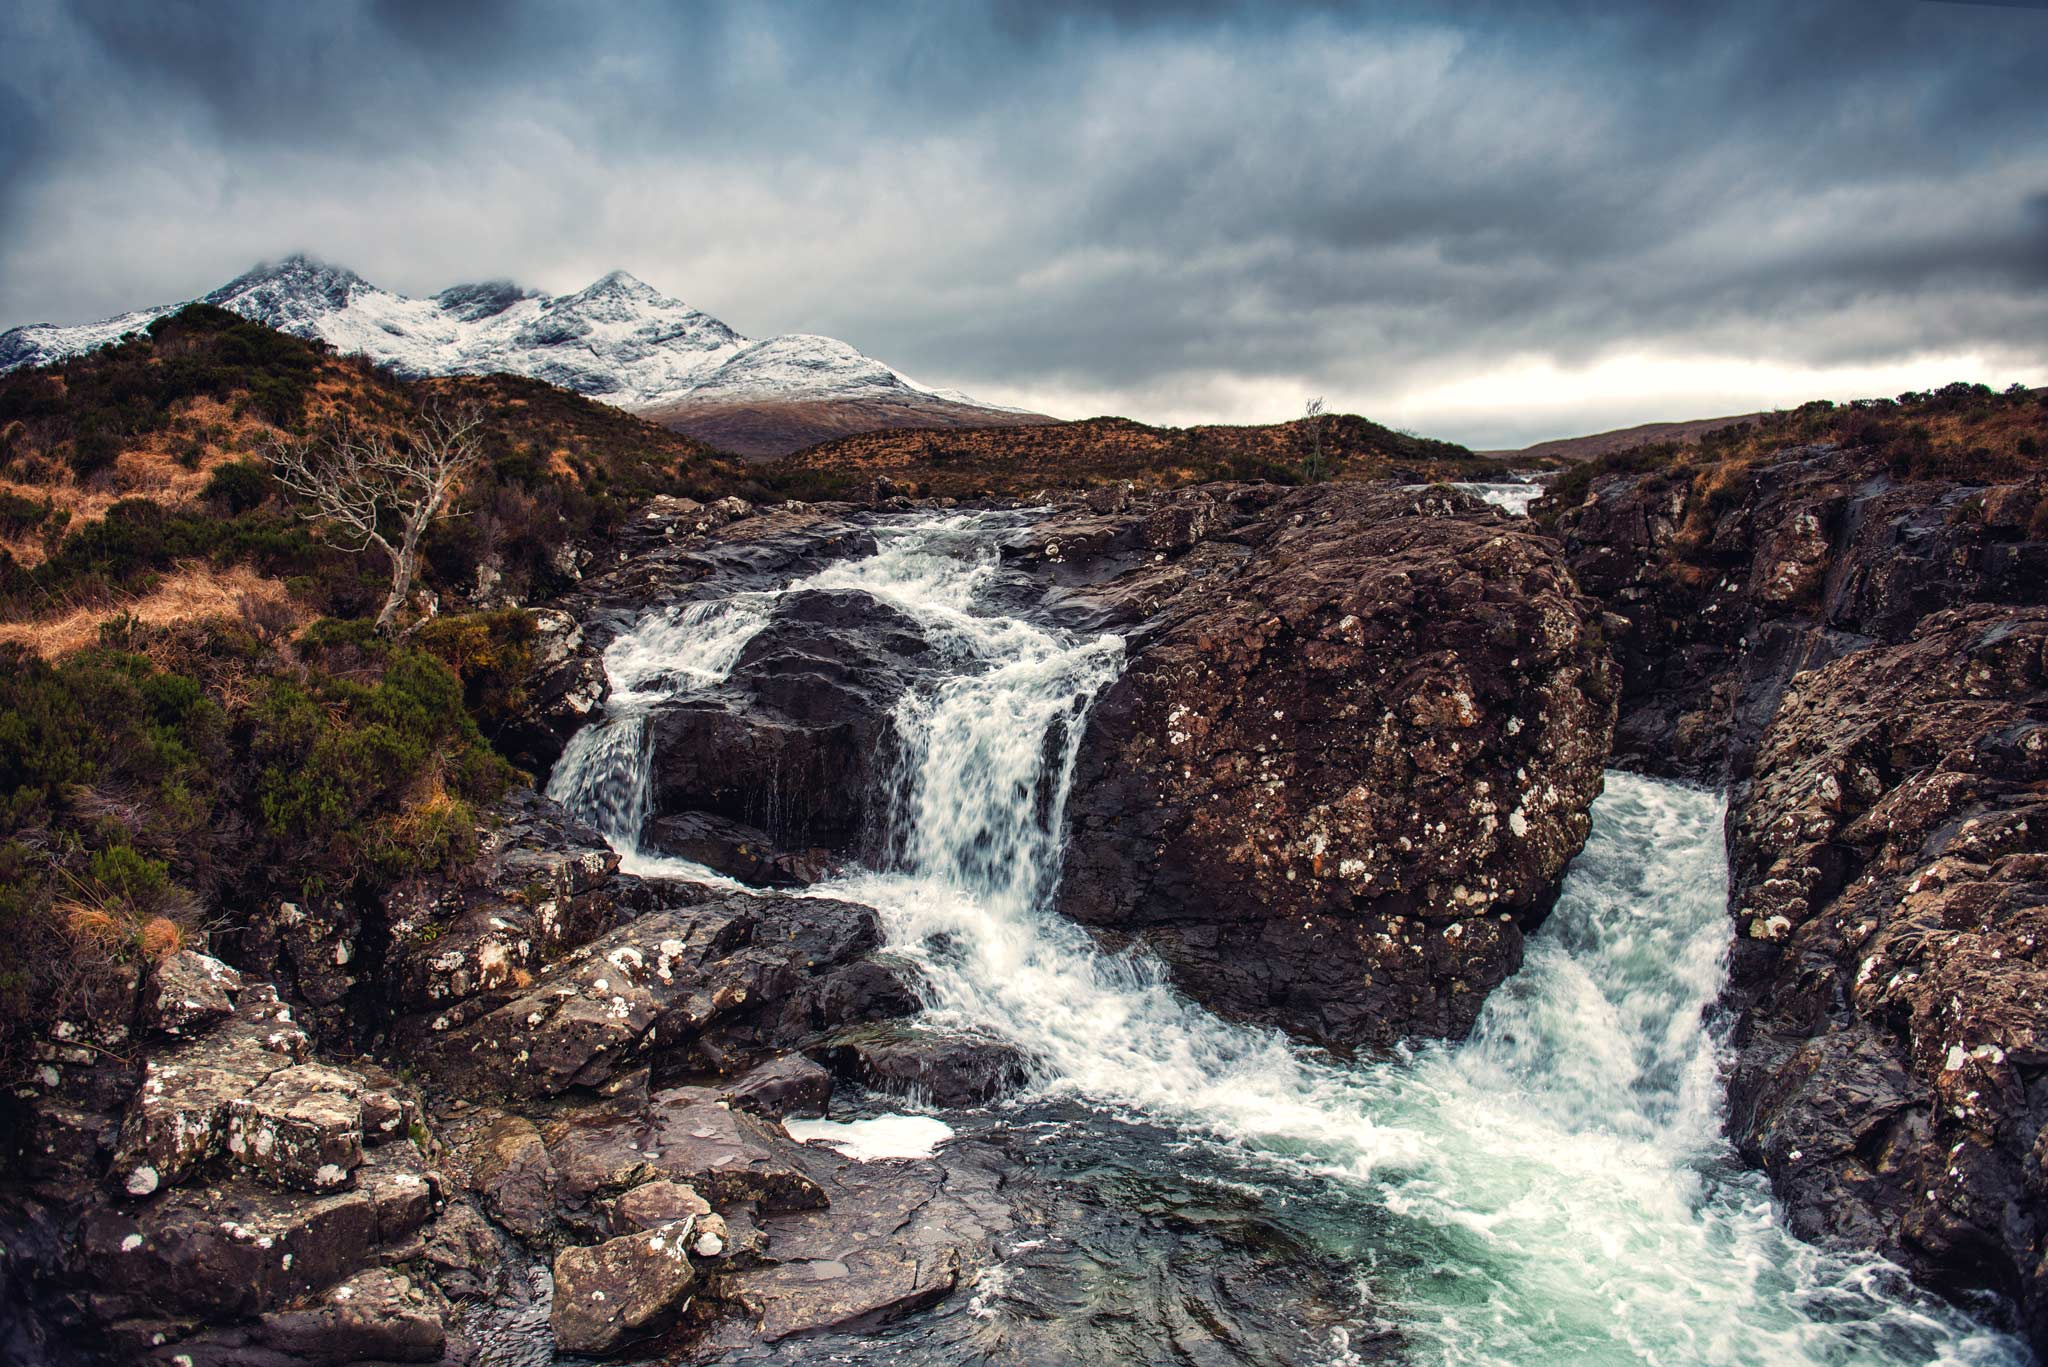 Sligachan Waterfalls - Skye. Image © Dean Wright Photography